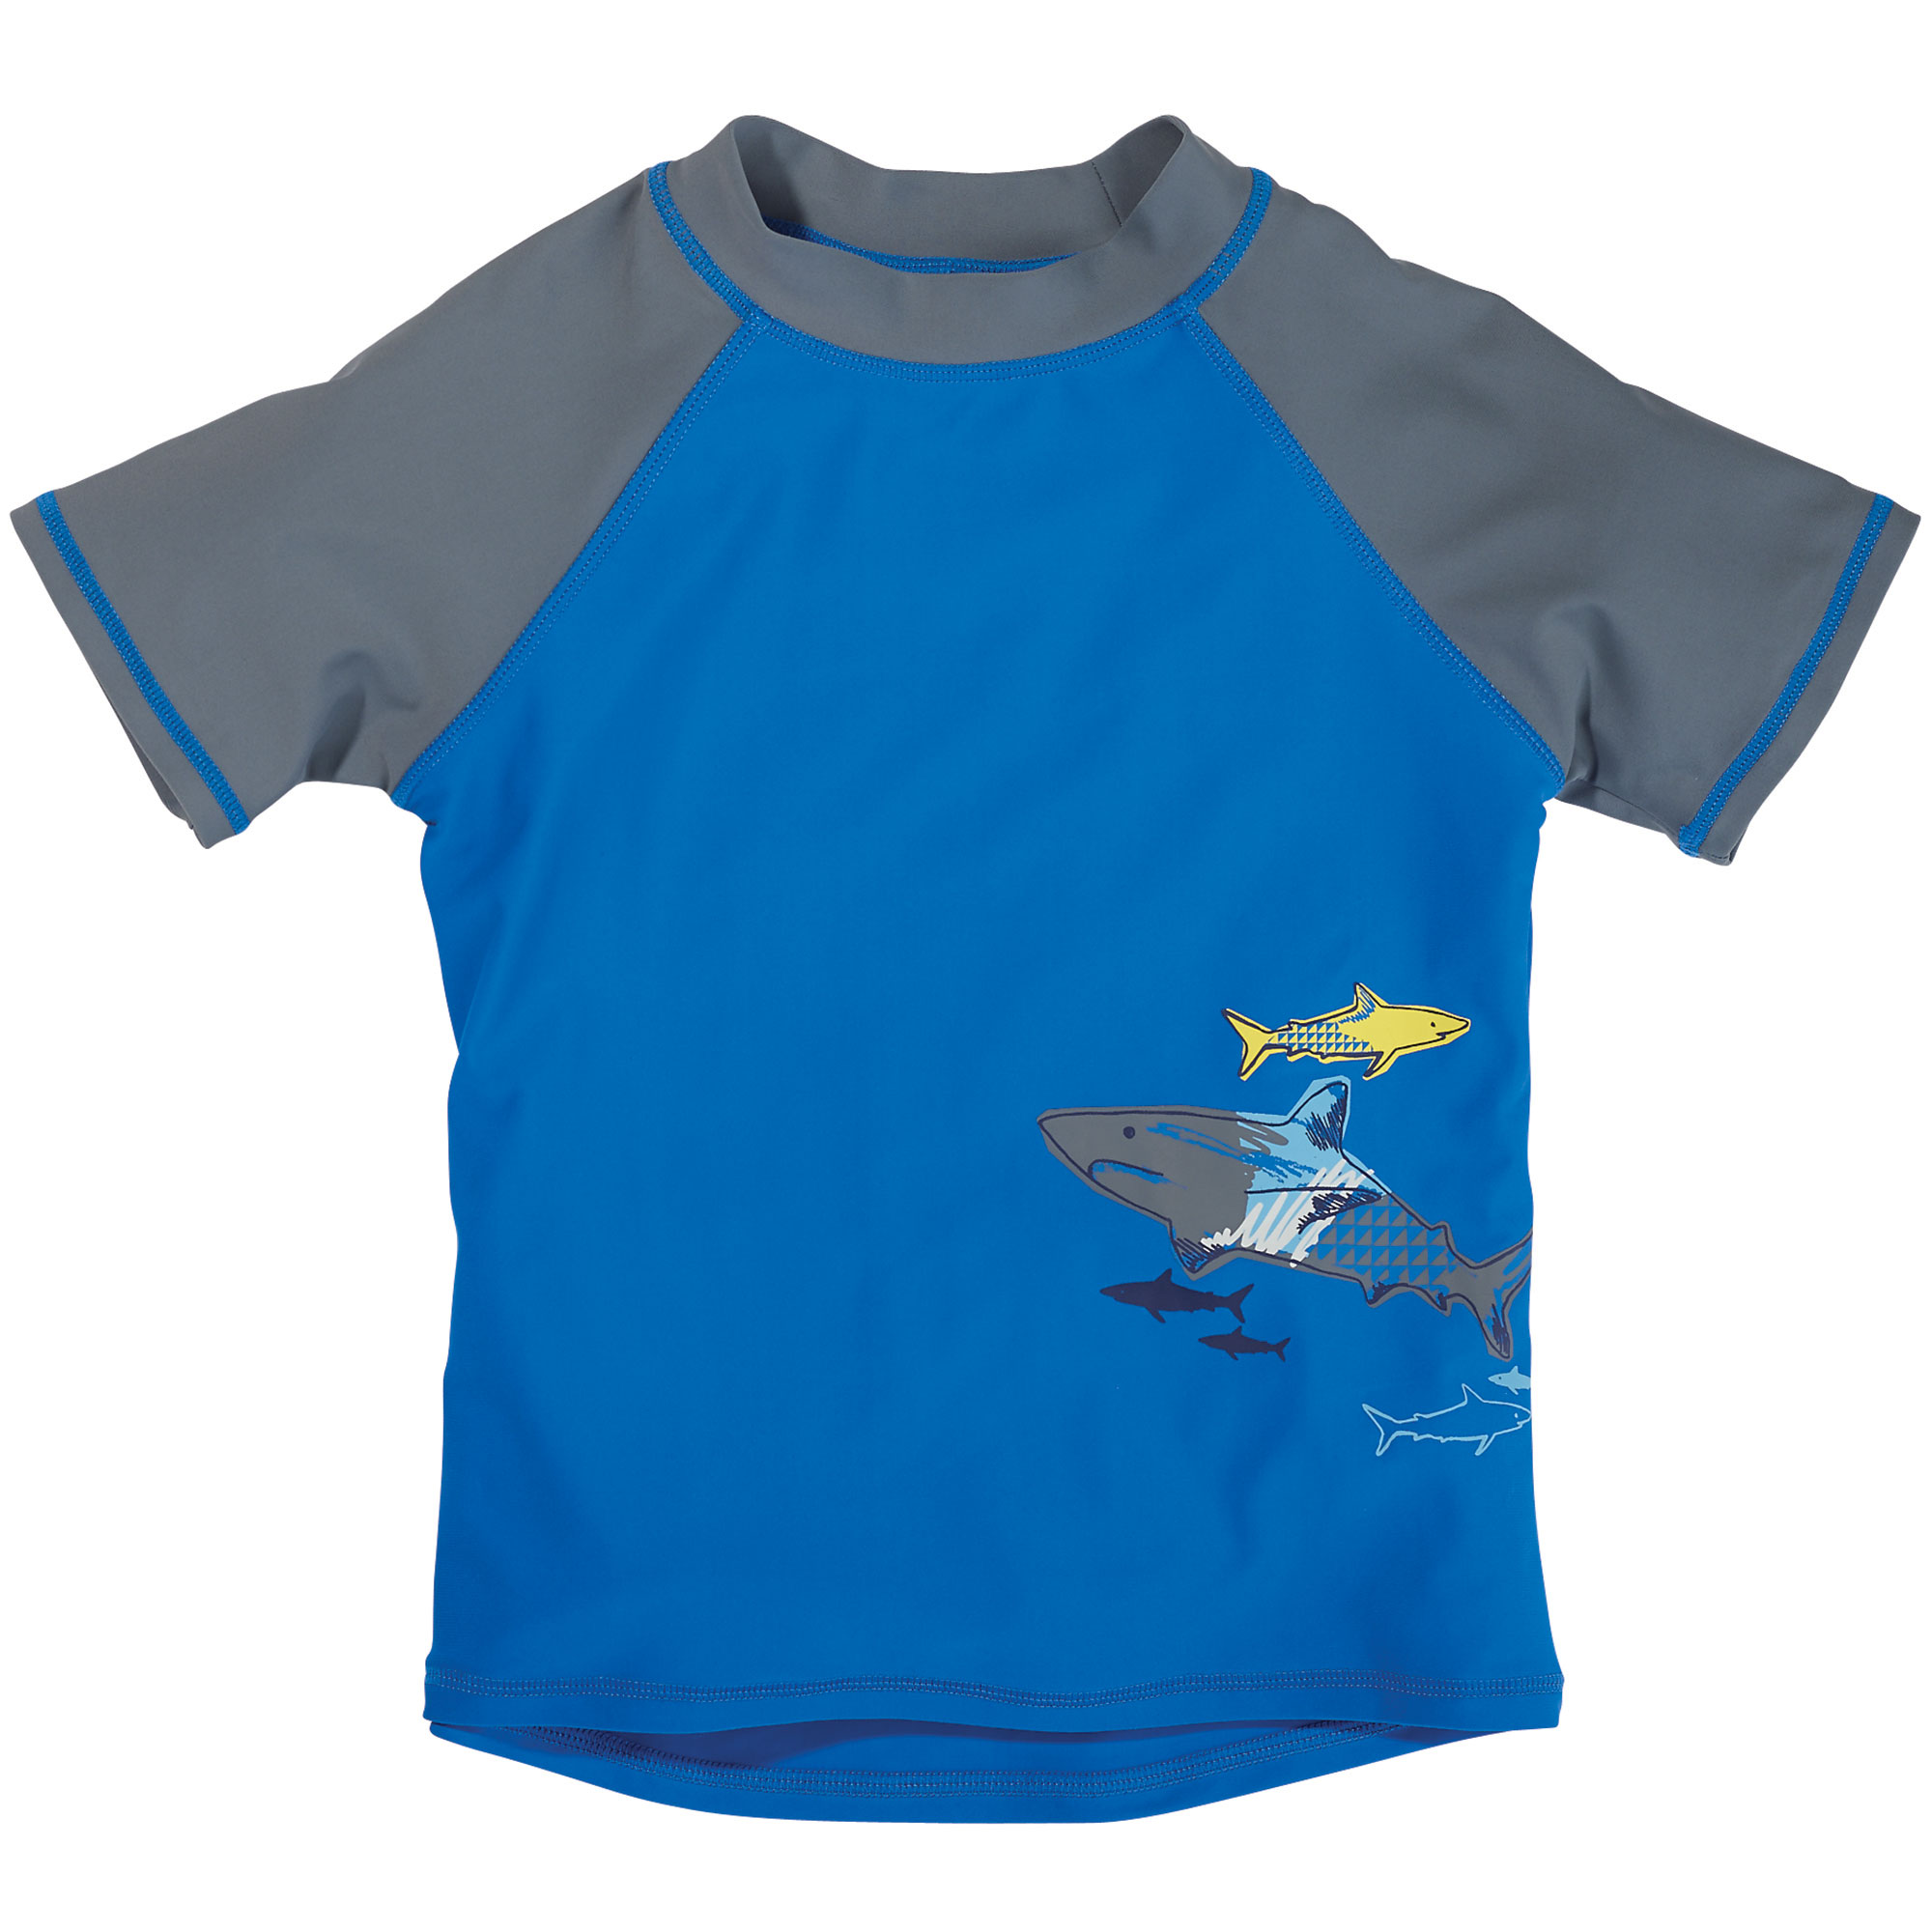 Sun Smarties Little Boy Rashguard - Blue and Gray with Shark Design - UPF 50+ Short Sleeve Swim Shirt